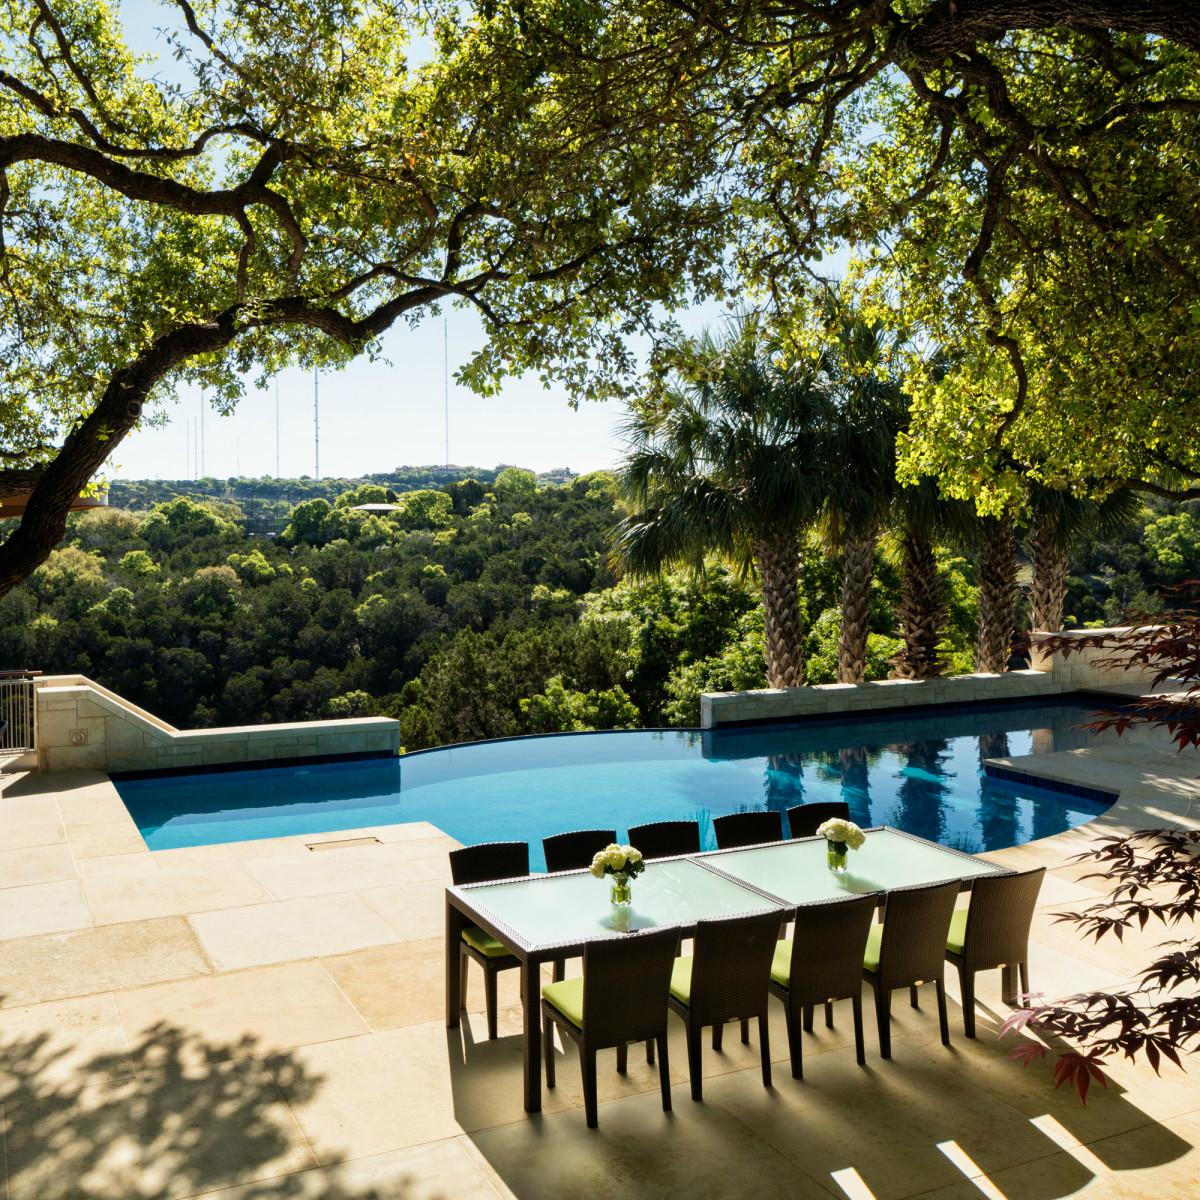 Austin house home 101 Pascal Lane Weslake Rob Roy neighborhood pool patio